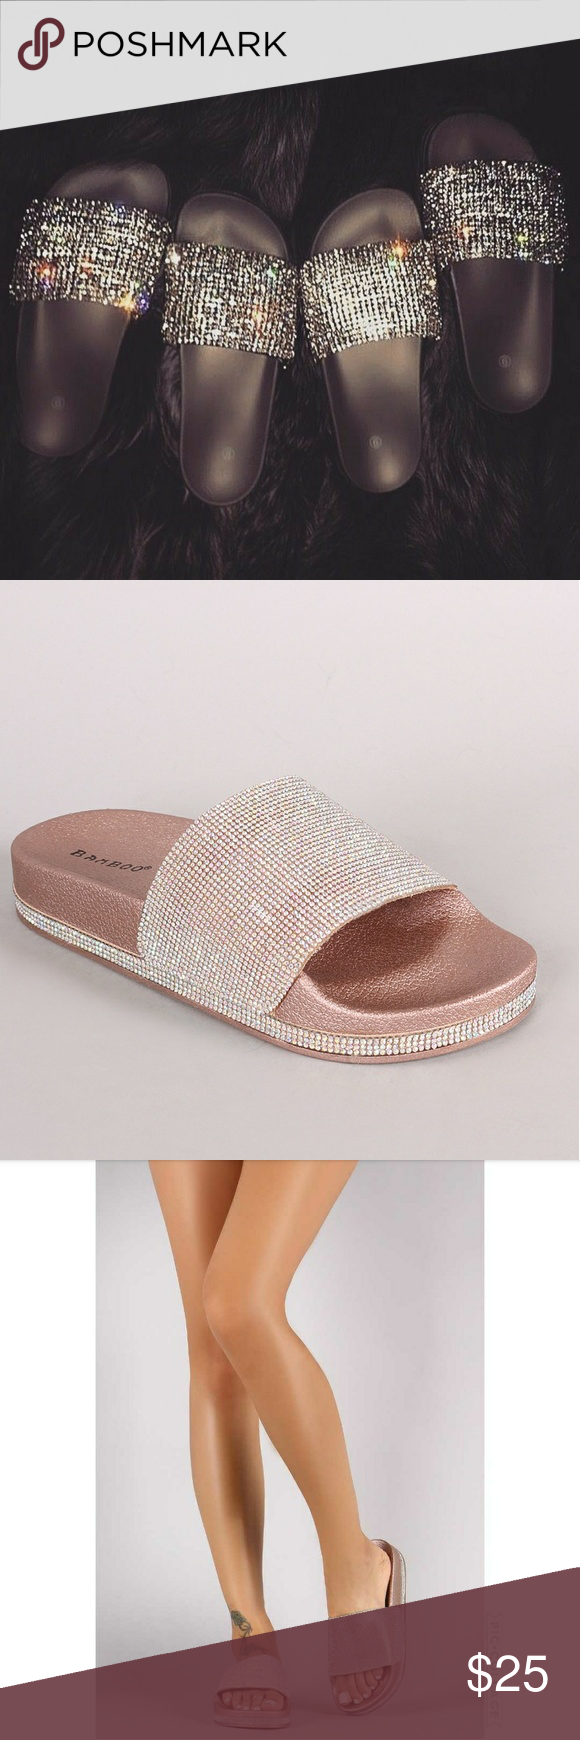 74f50c66e77cbc Rose Gold Swarovski rhinestones Open Toe Sandal This fabulous slide sandal  features an open toe silhouette